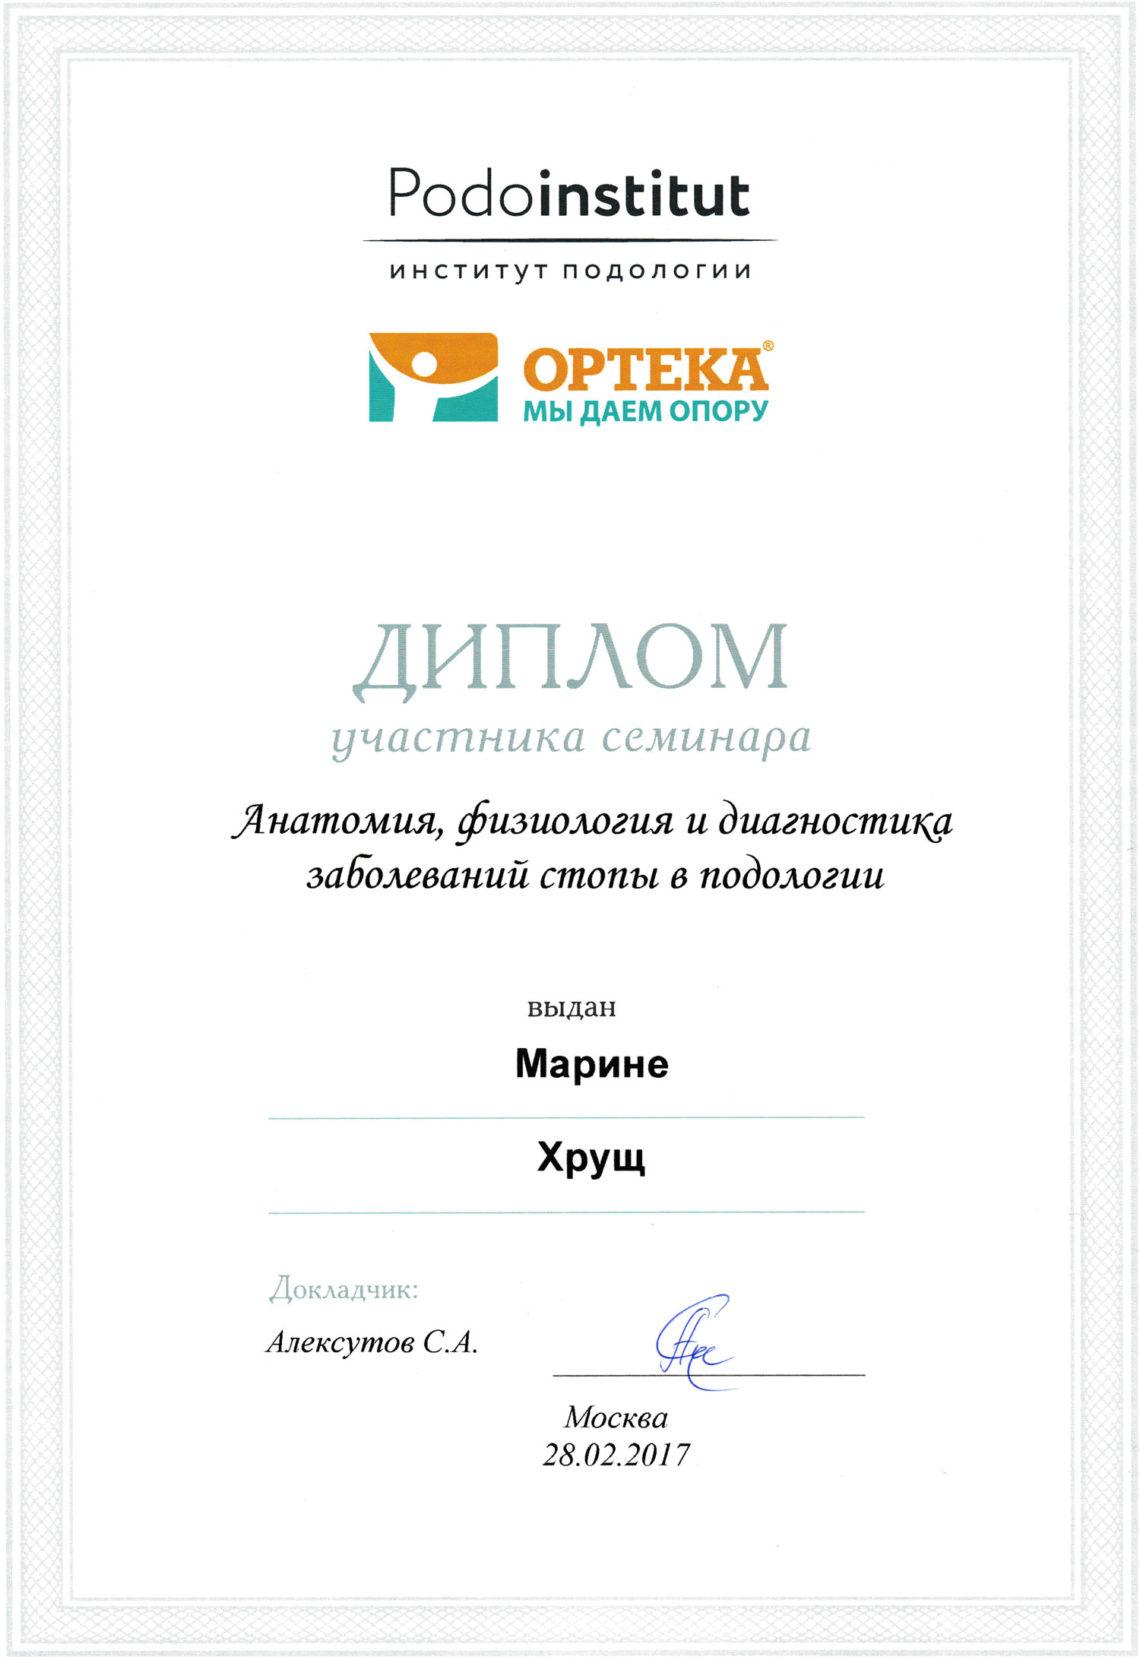 Podoinstitut ОРТЕКА сертификат подолог хрущ марина васильевна